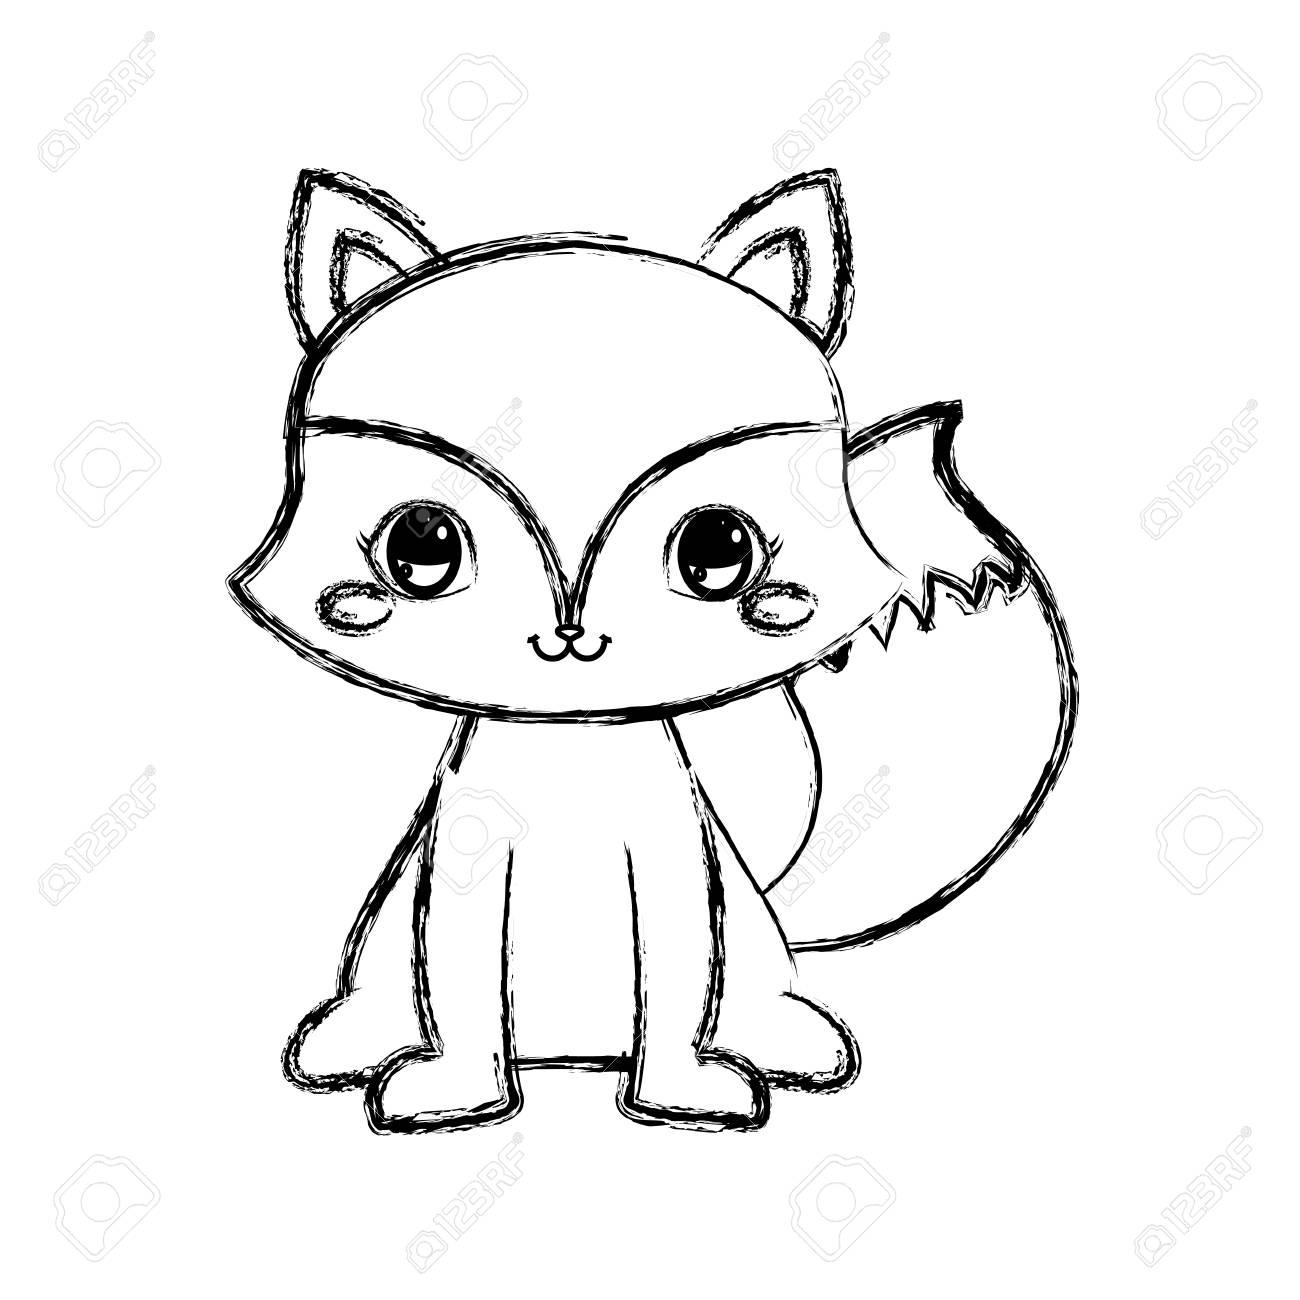 Cute Fox Cartoon Animal Wildlife Vector Illustration Hand Drawing Royalty Free Cliparts Vectors And Stock Illustration Image 109894513